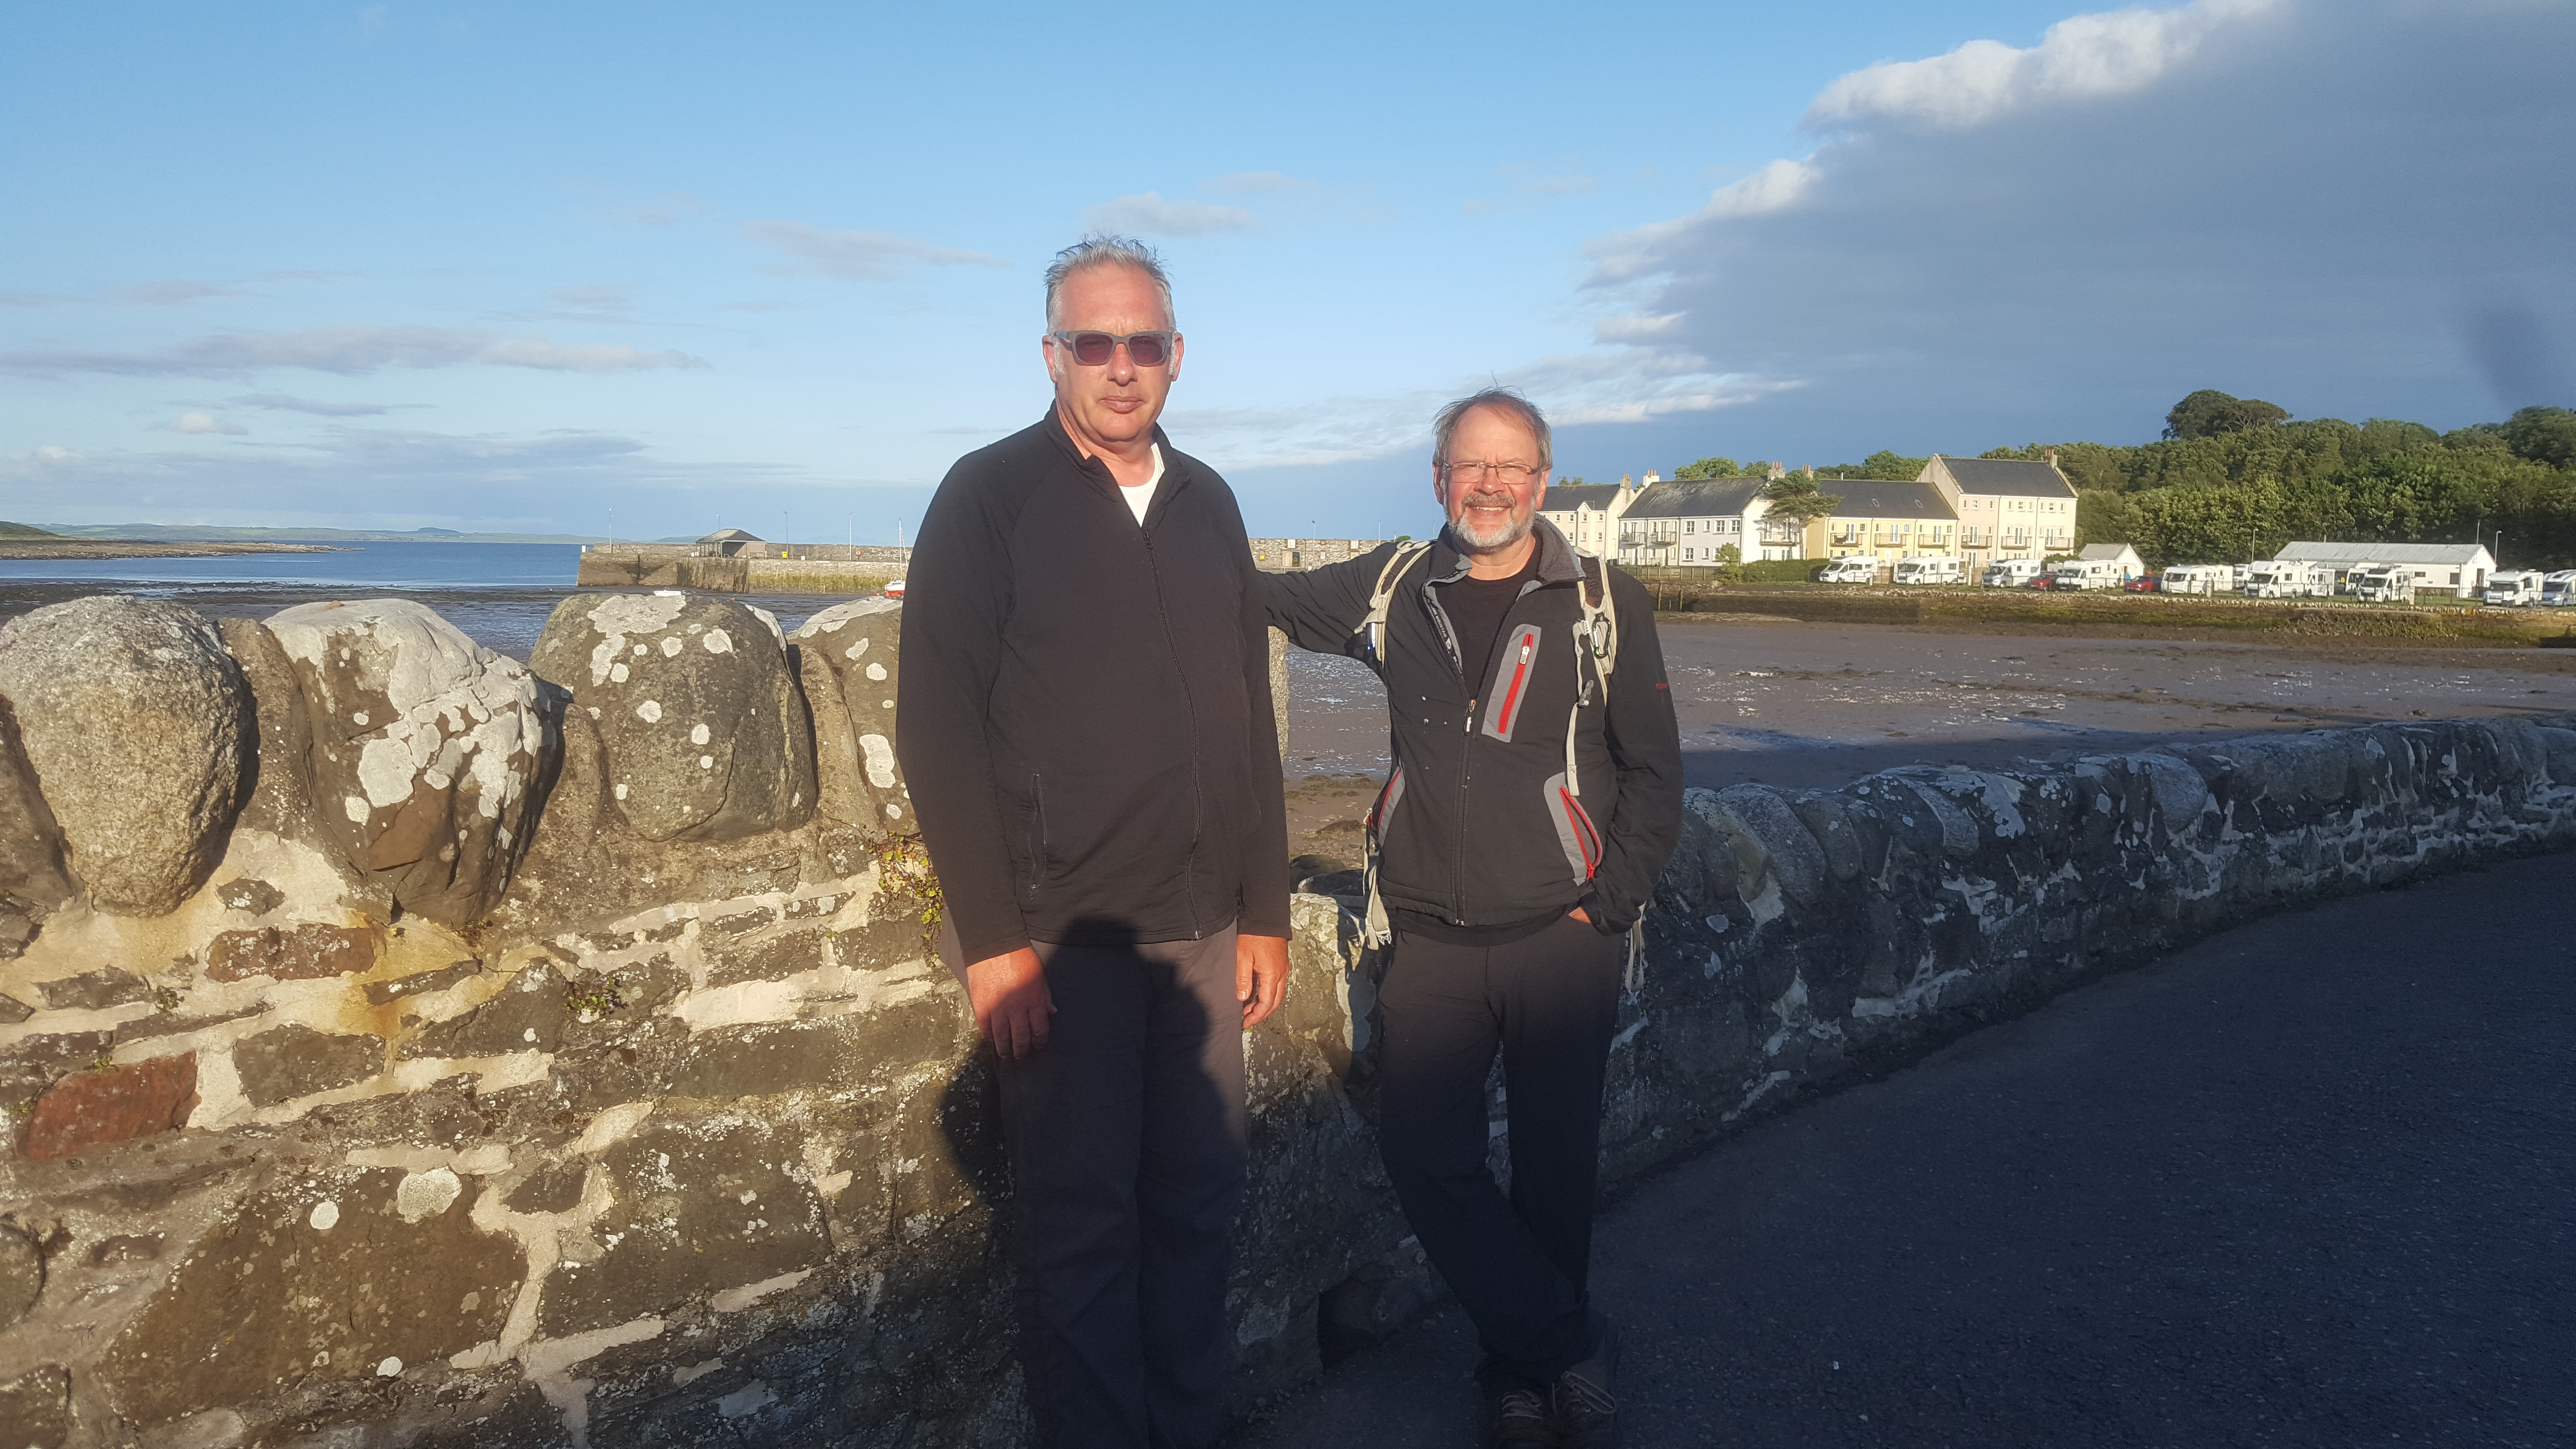 Ken and Matthew at harbour